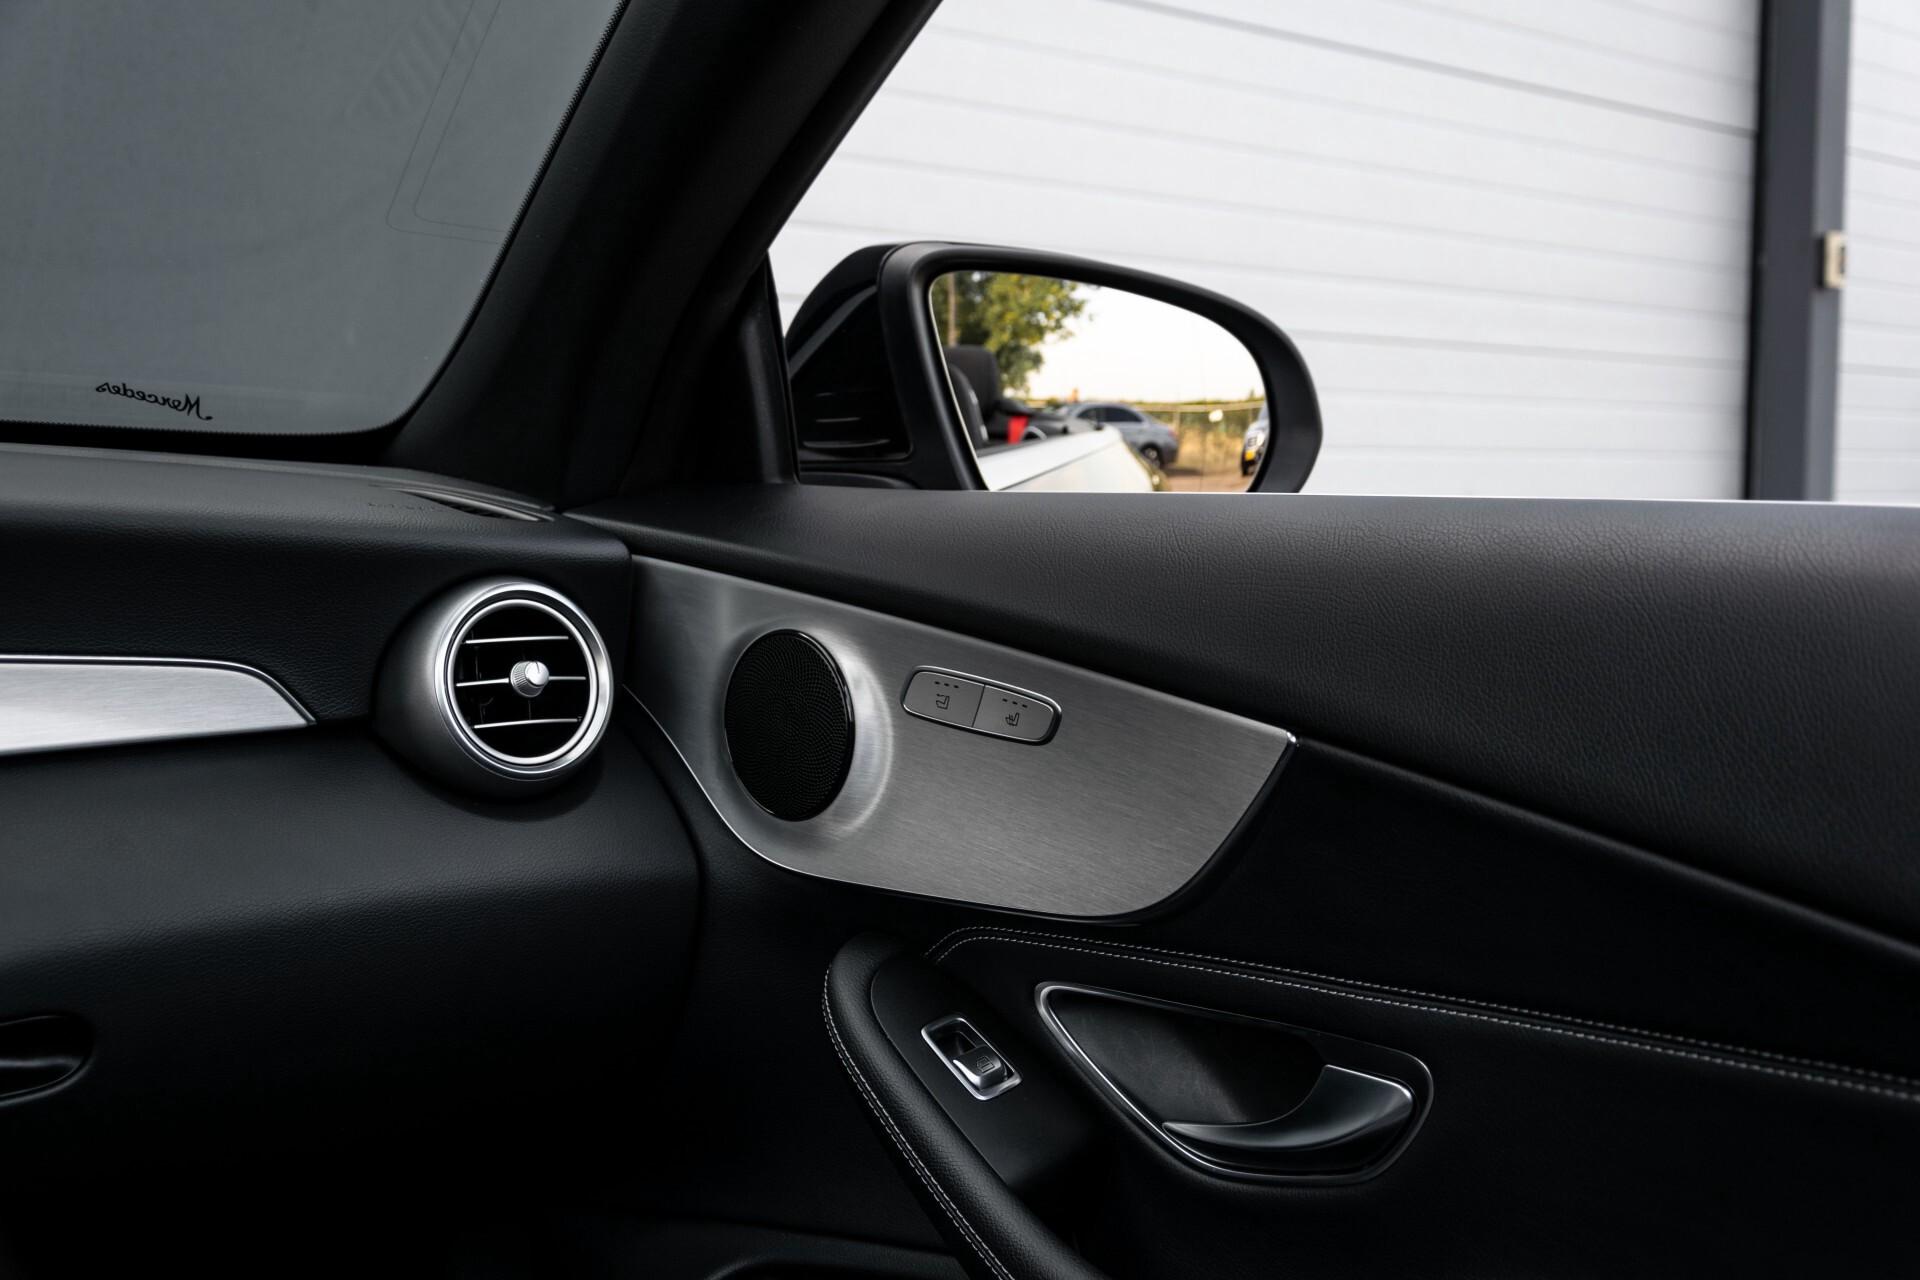 Mercedes-Benz C-Klasse Cabrio 250 AMG Airscarf/Aircap/Comand/ILS/Camera/Rode cabriokap Aut9 Foto 48